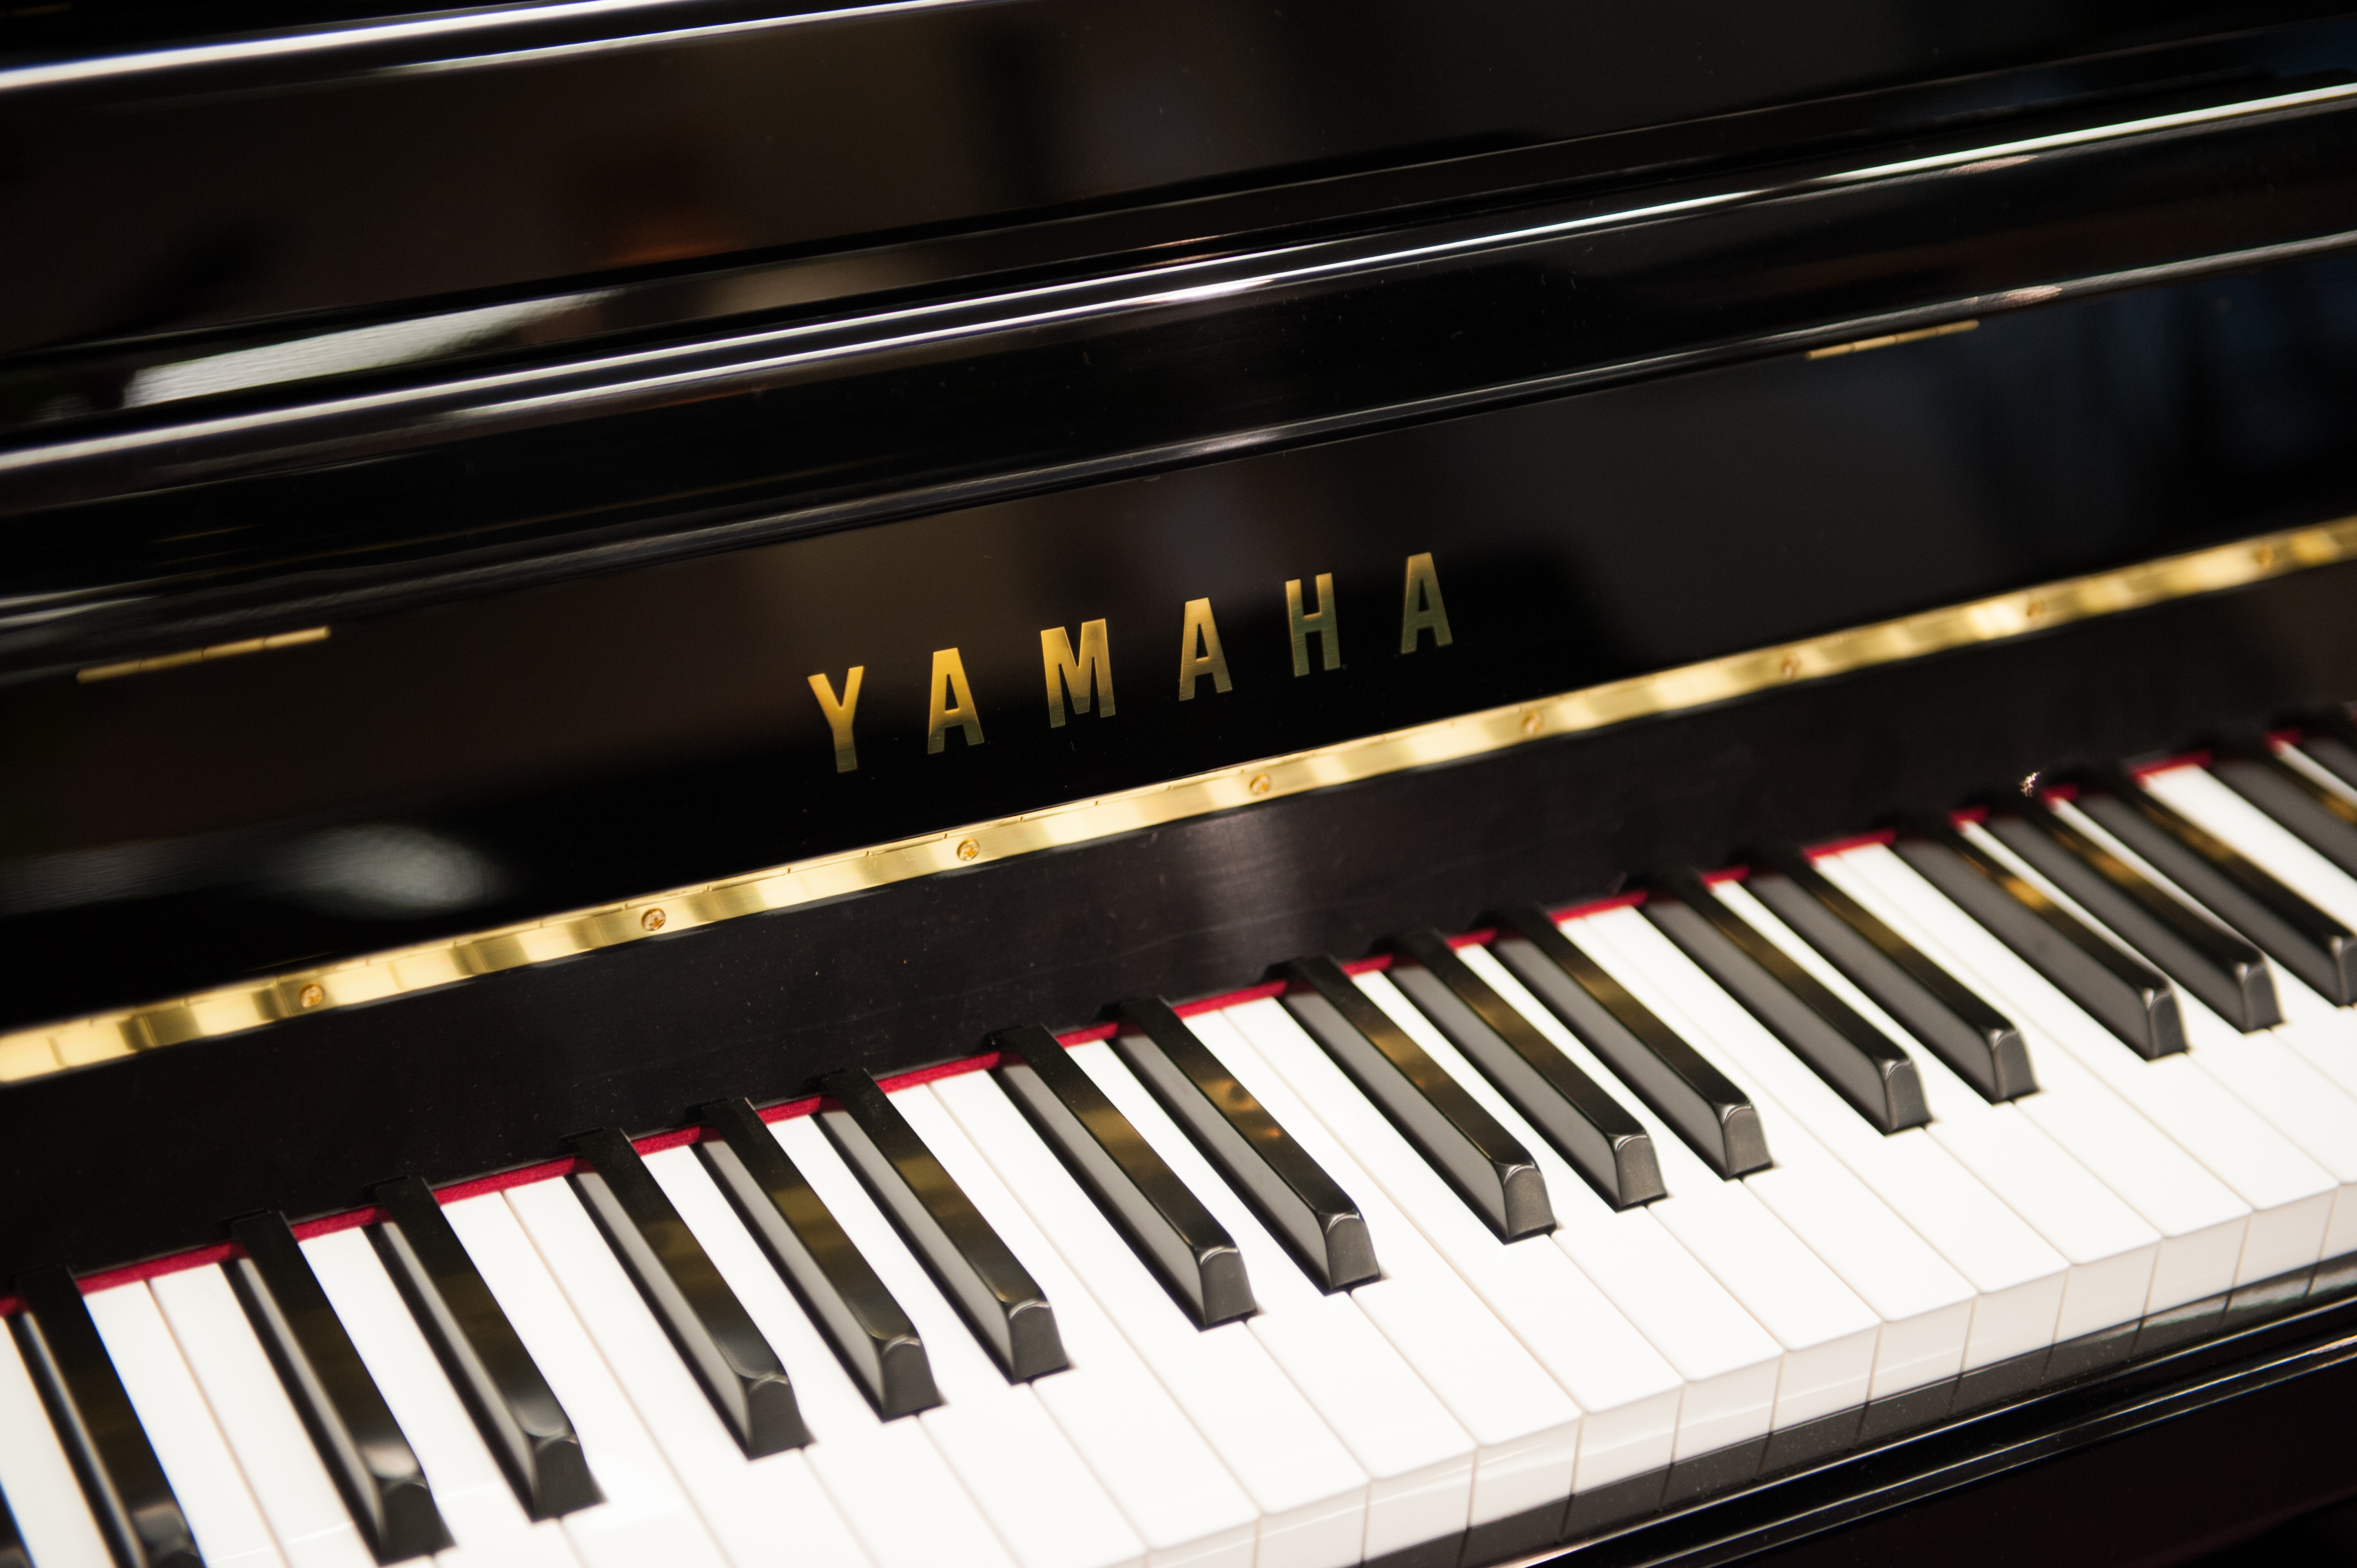 Yamaha keys